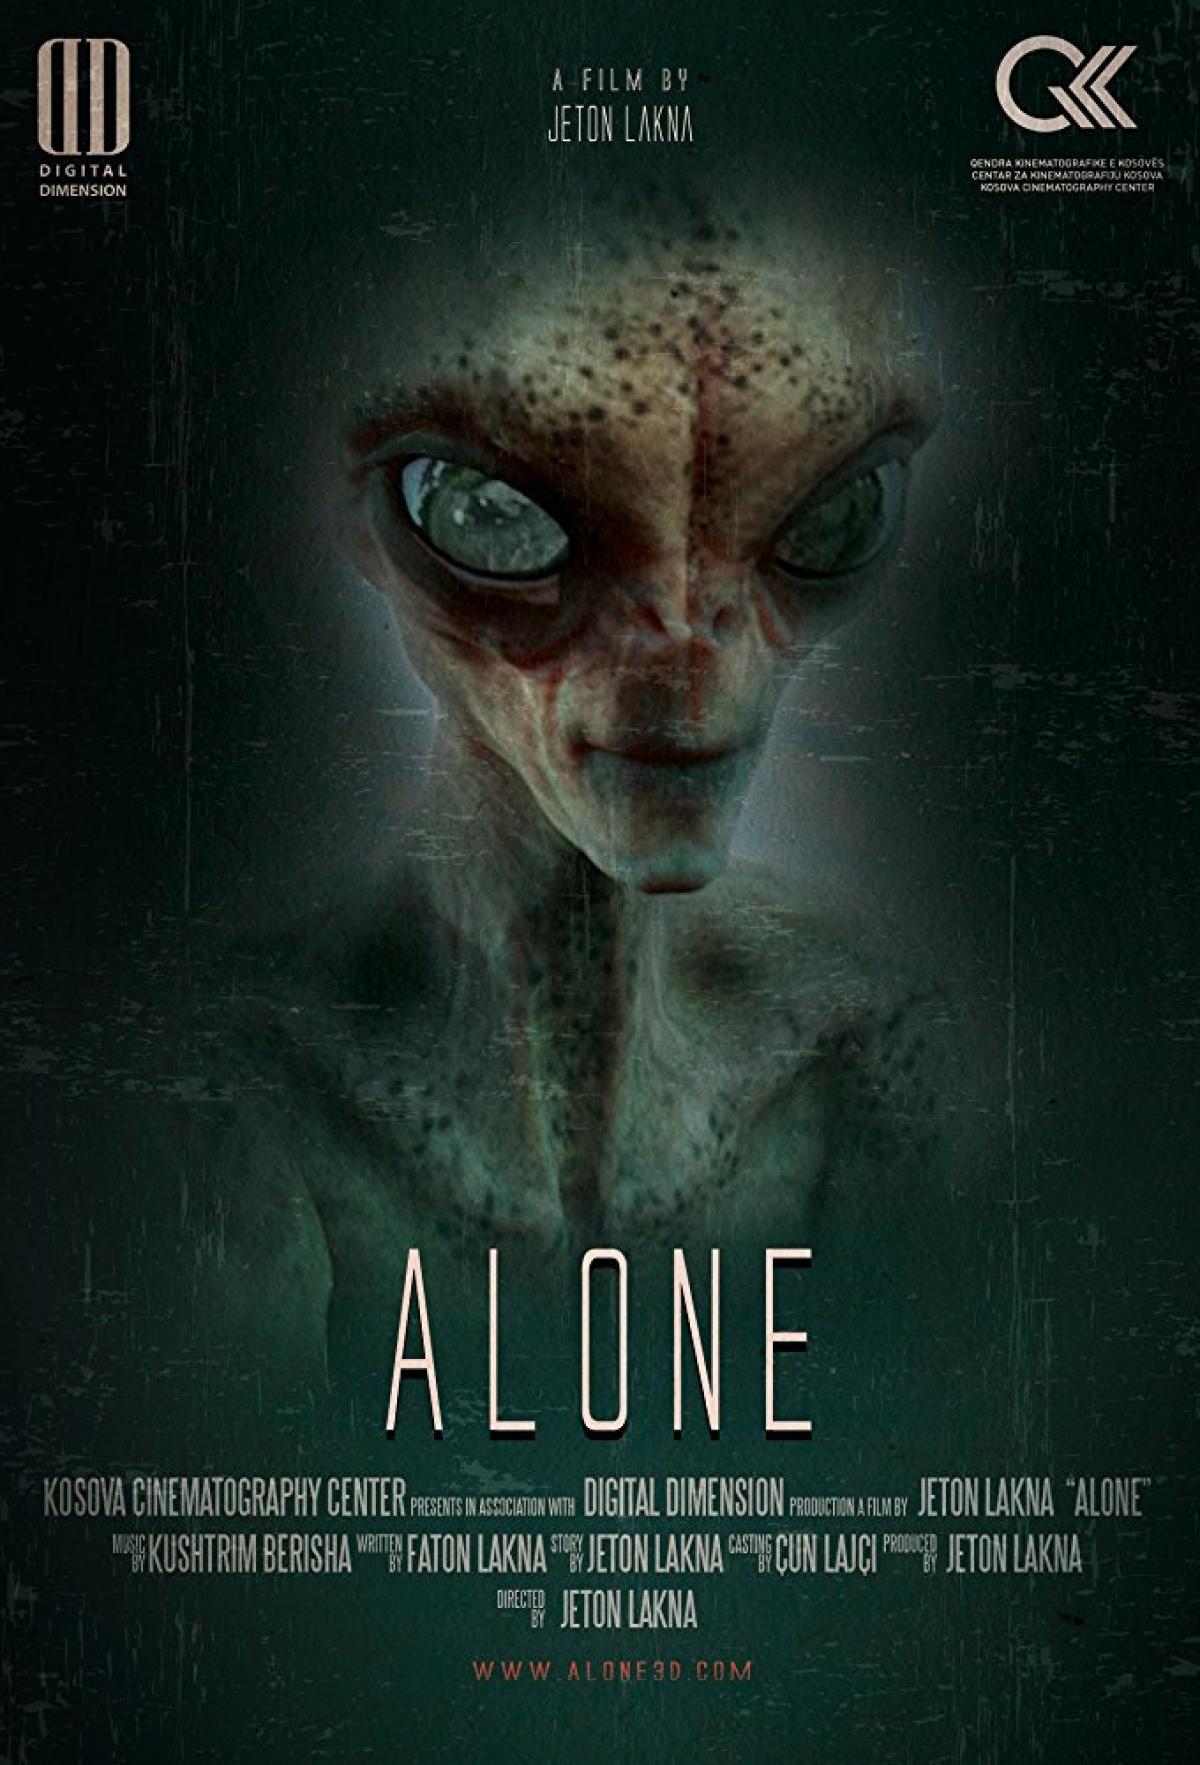 ALONE - Animation Film | Kosovo Cinematography Center